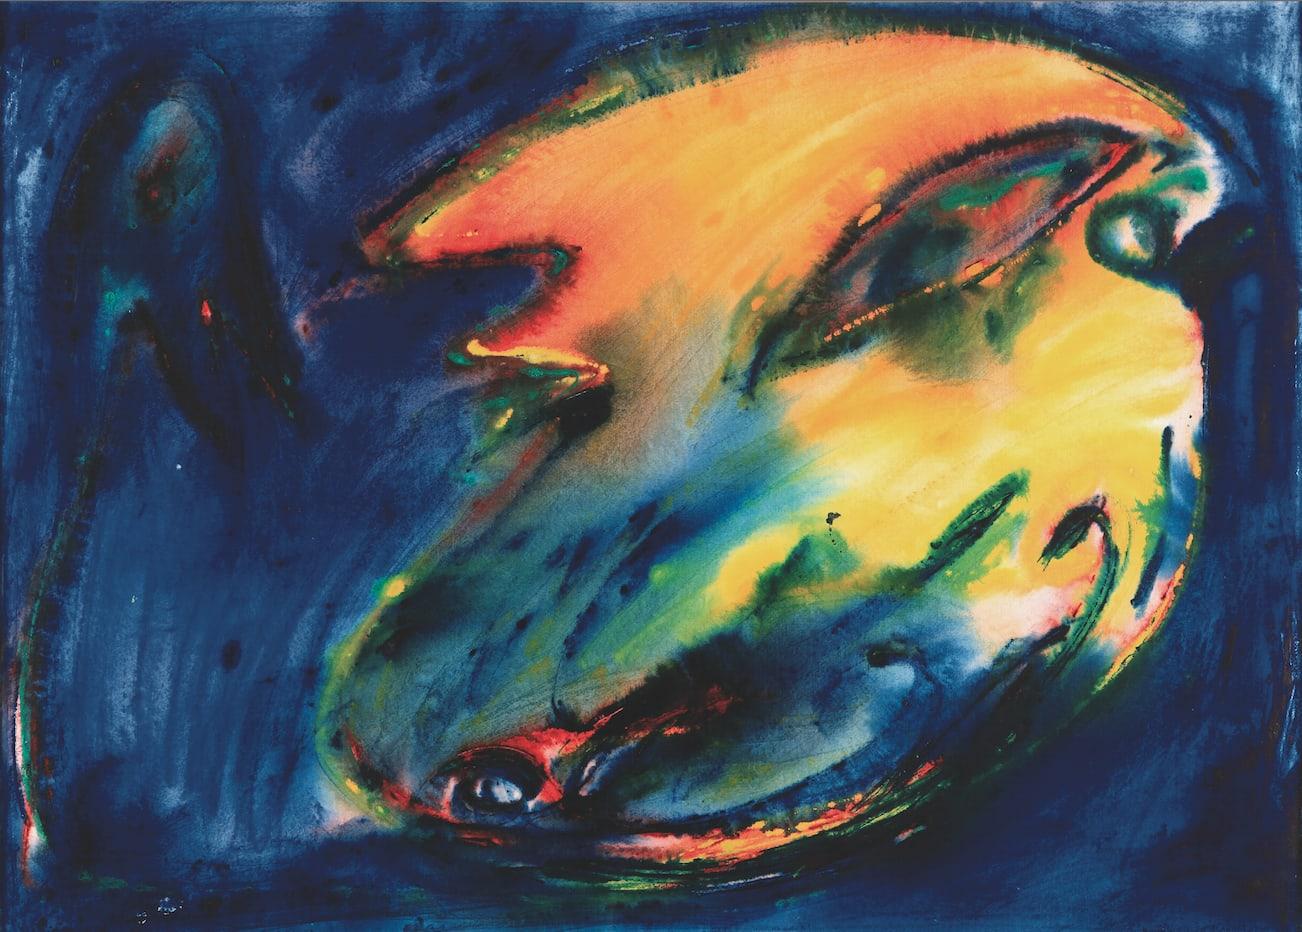 "<span class=""link fancybox-details-link""><a href=""/artists/86-carl-henning-pedersen/works/1094-carl-henning-pedersen-sljennesqi-ashkelon-1979/"">View Detail Page</a></span><div class=""artist""><strong>Carl-henning Pedersen</strong></div> <div class=""title""><em>Sljennesqi, Ashkelon,,, </em>, 1979</div> <div class=""medium"">watercolors</div> <div class=""dimensions"">cm 56x78</div>"